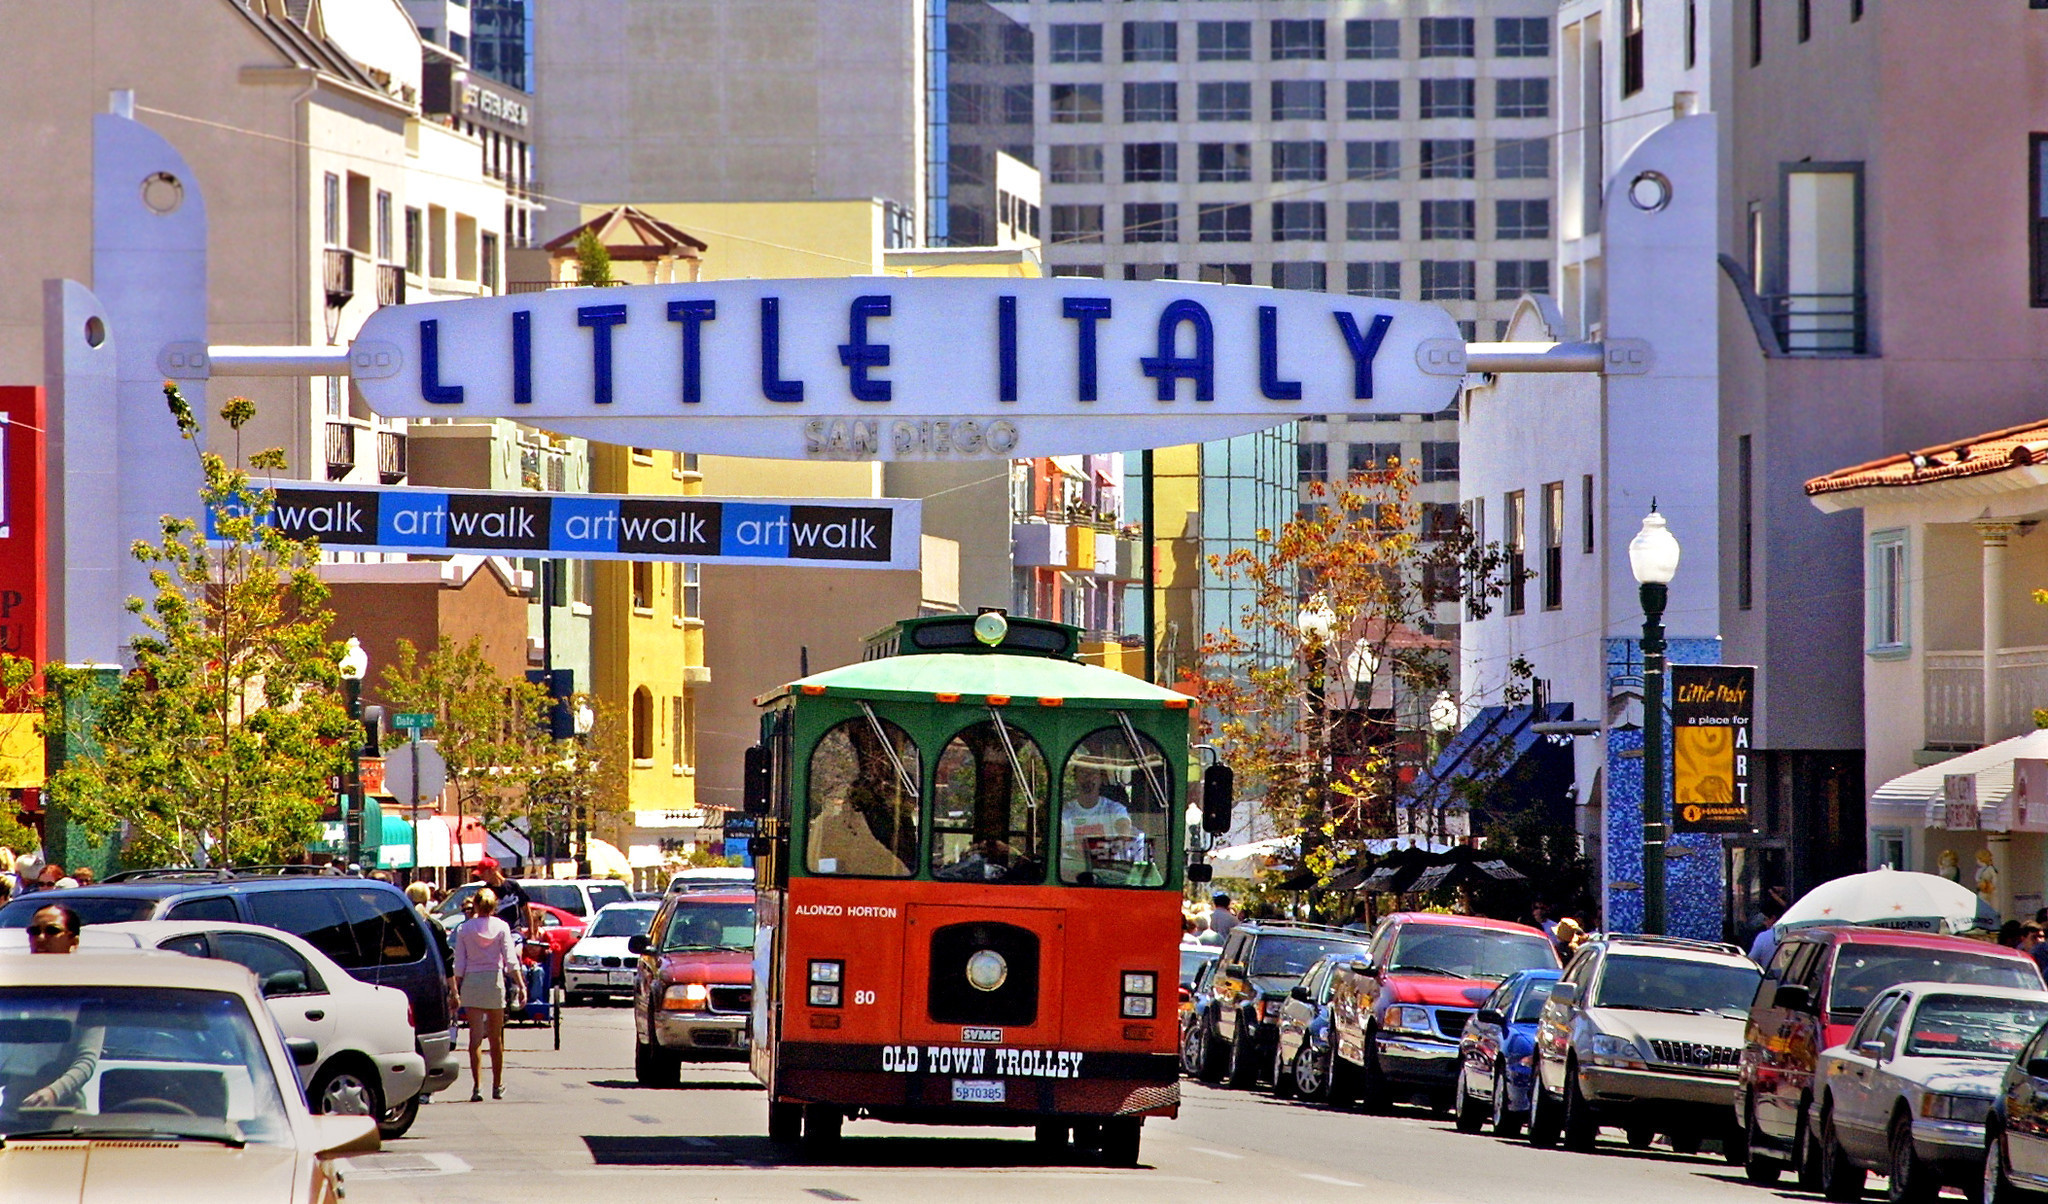 Little Italy.jpg